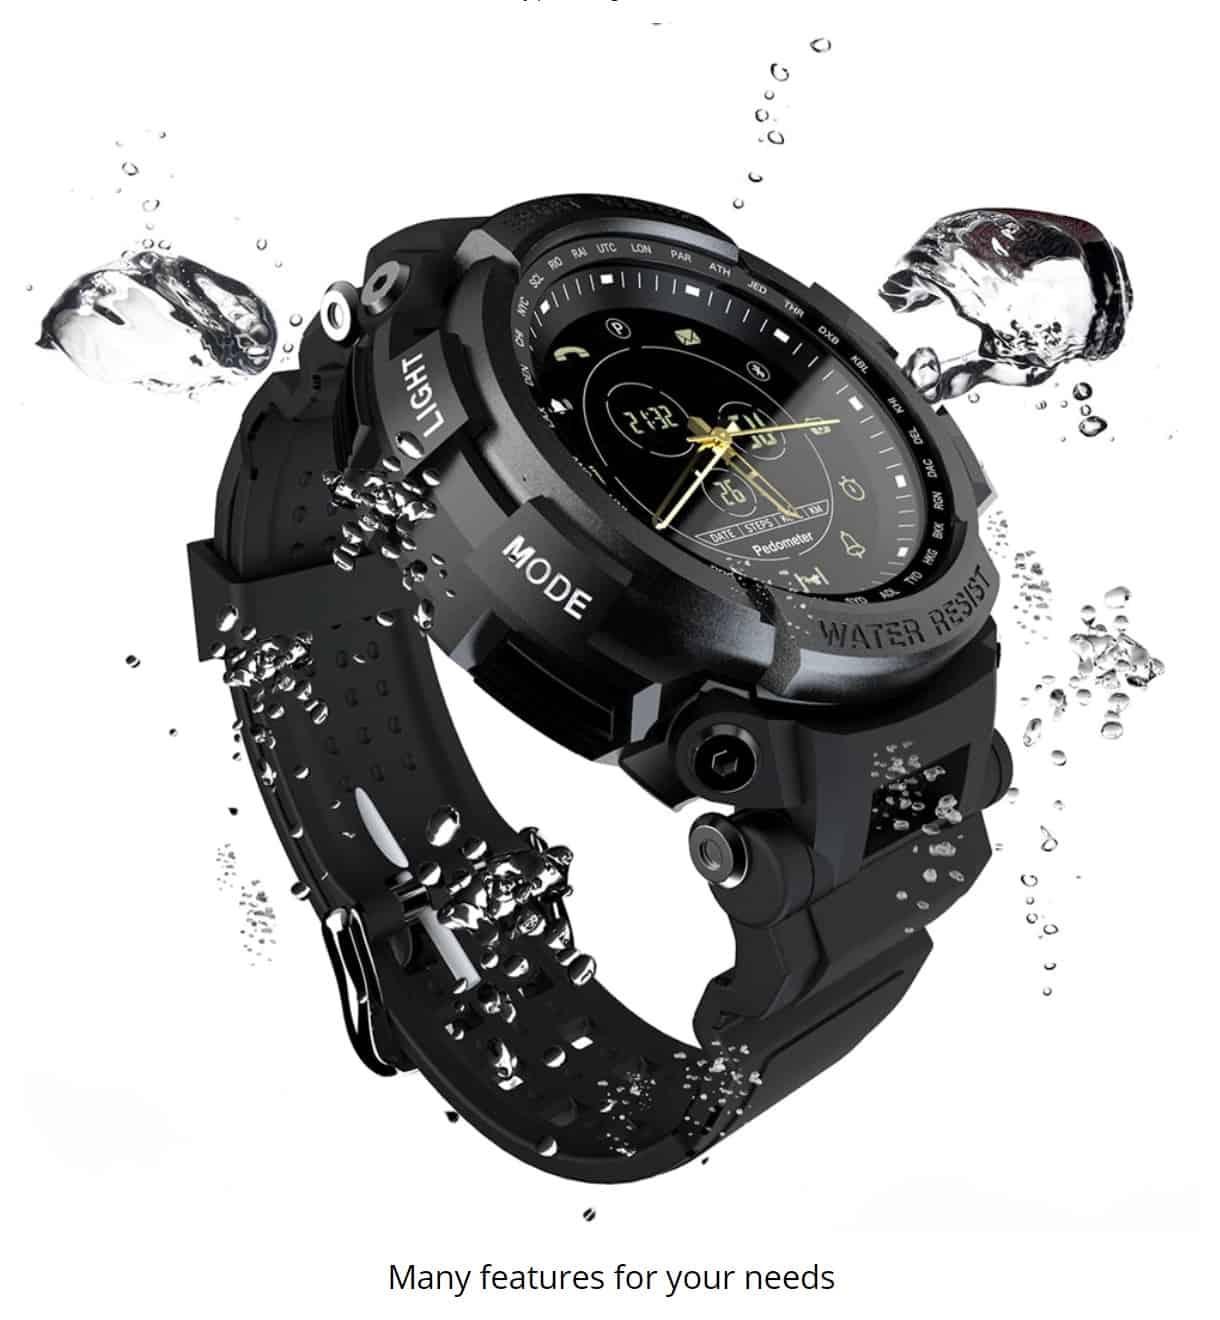 smartwatch replica Lokmat Casio Lookalike Gshock Water Resistant Apple Watch Clone Cheap